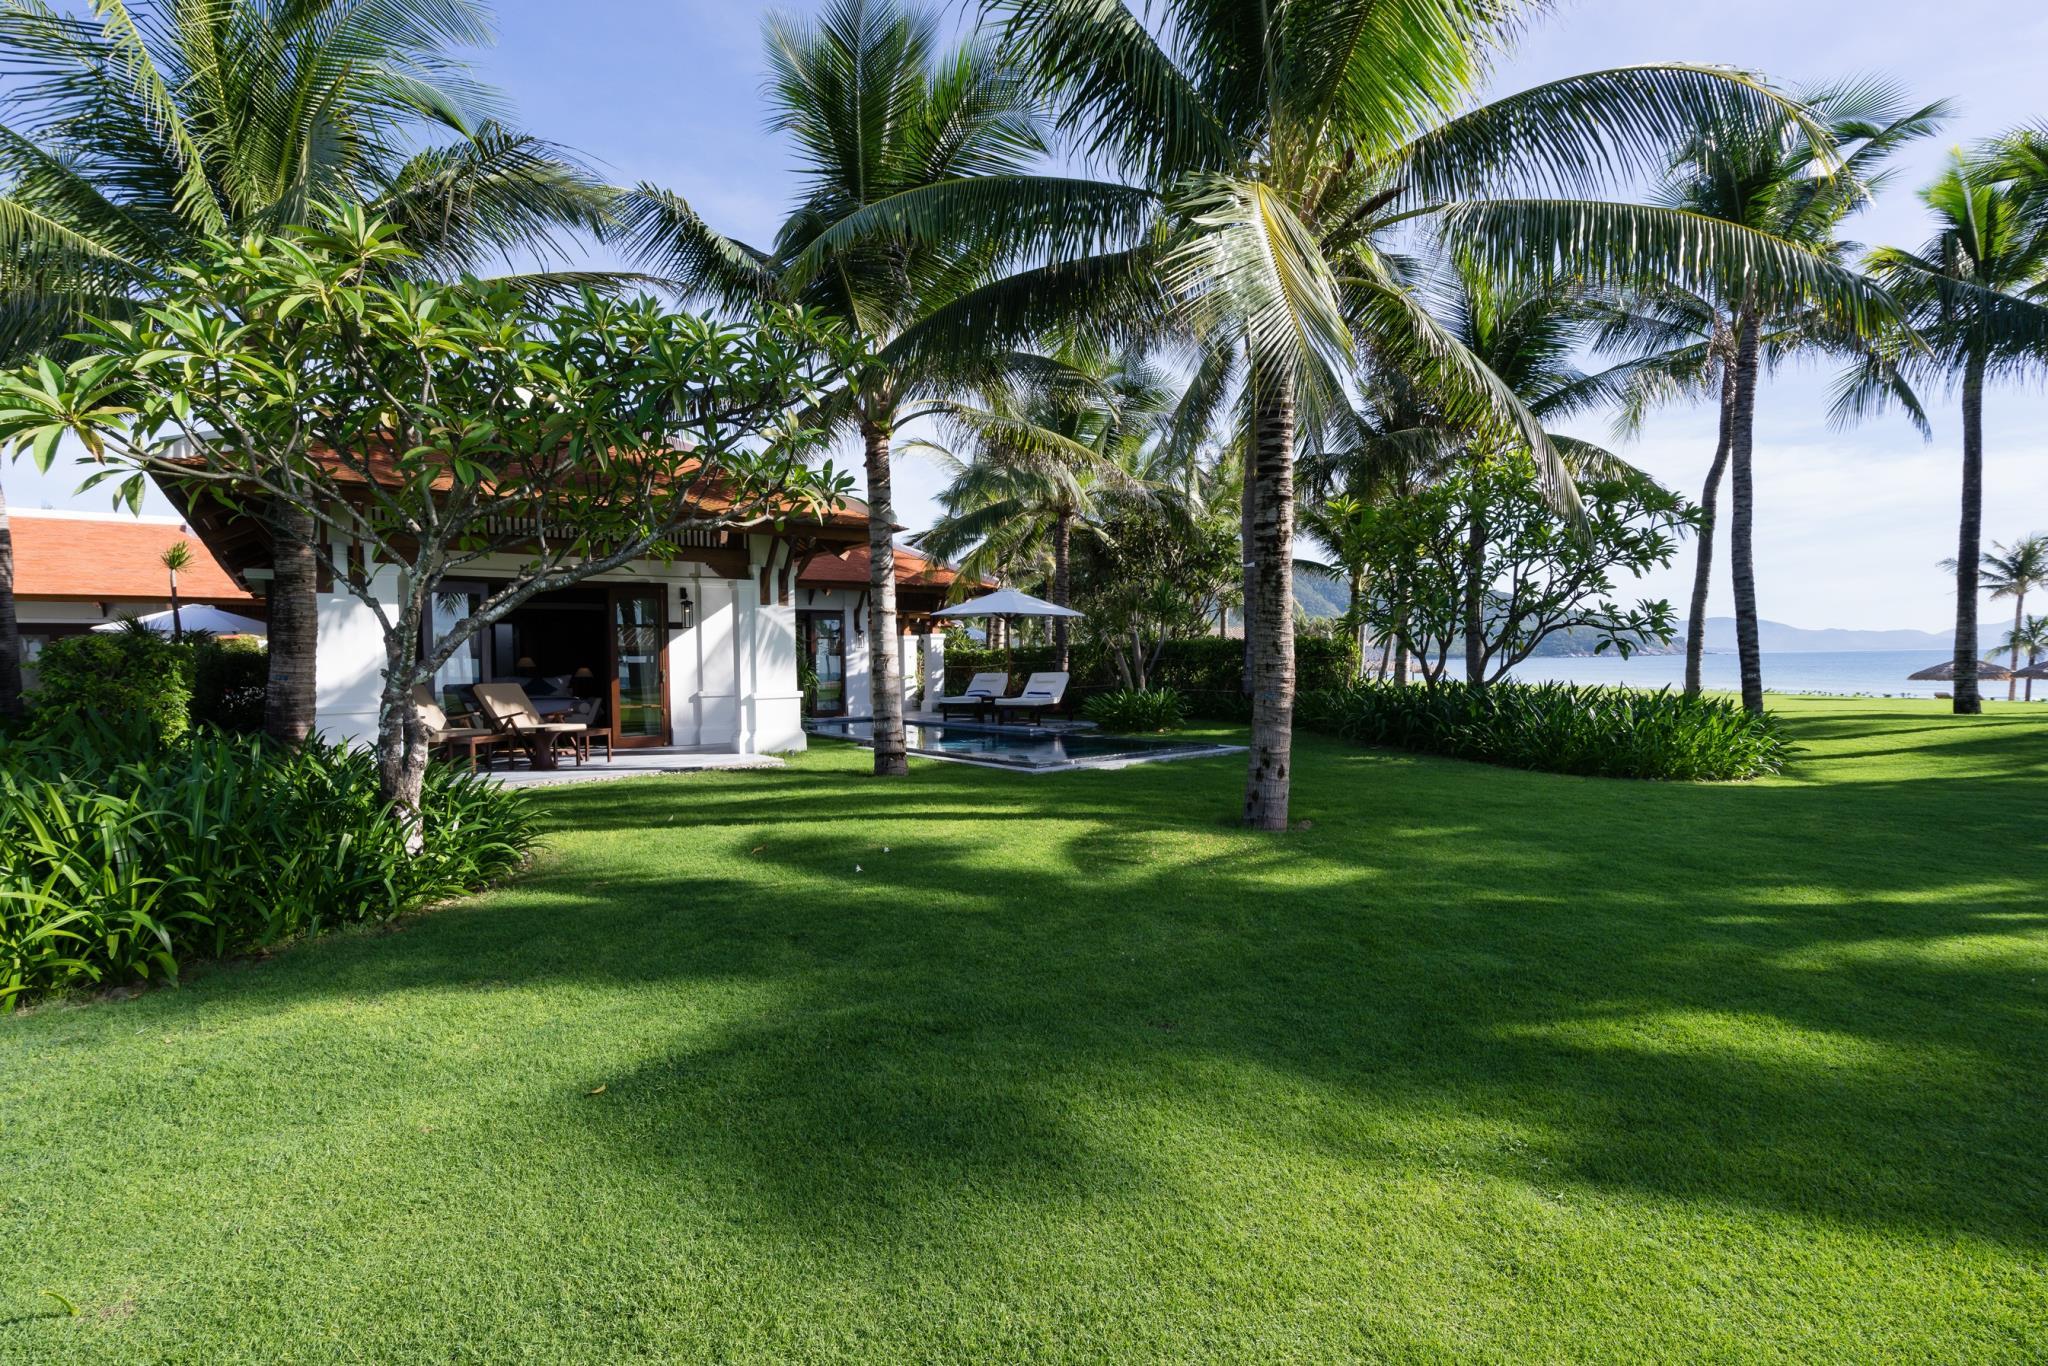 3-resort-cam-ranh-nha-trang-ivivu-19